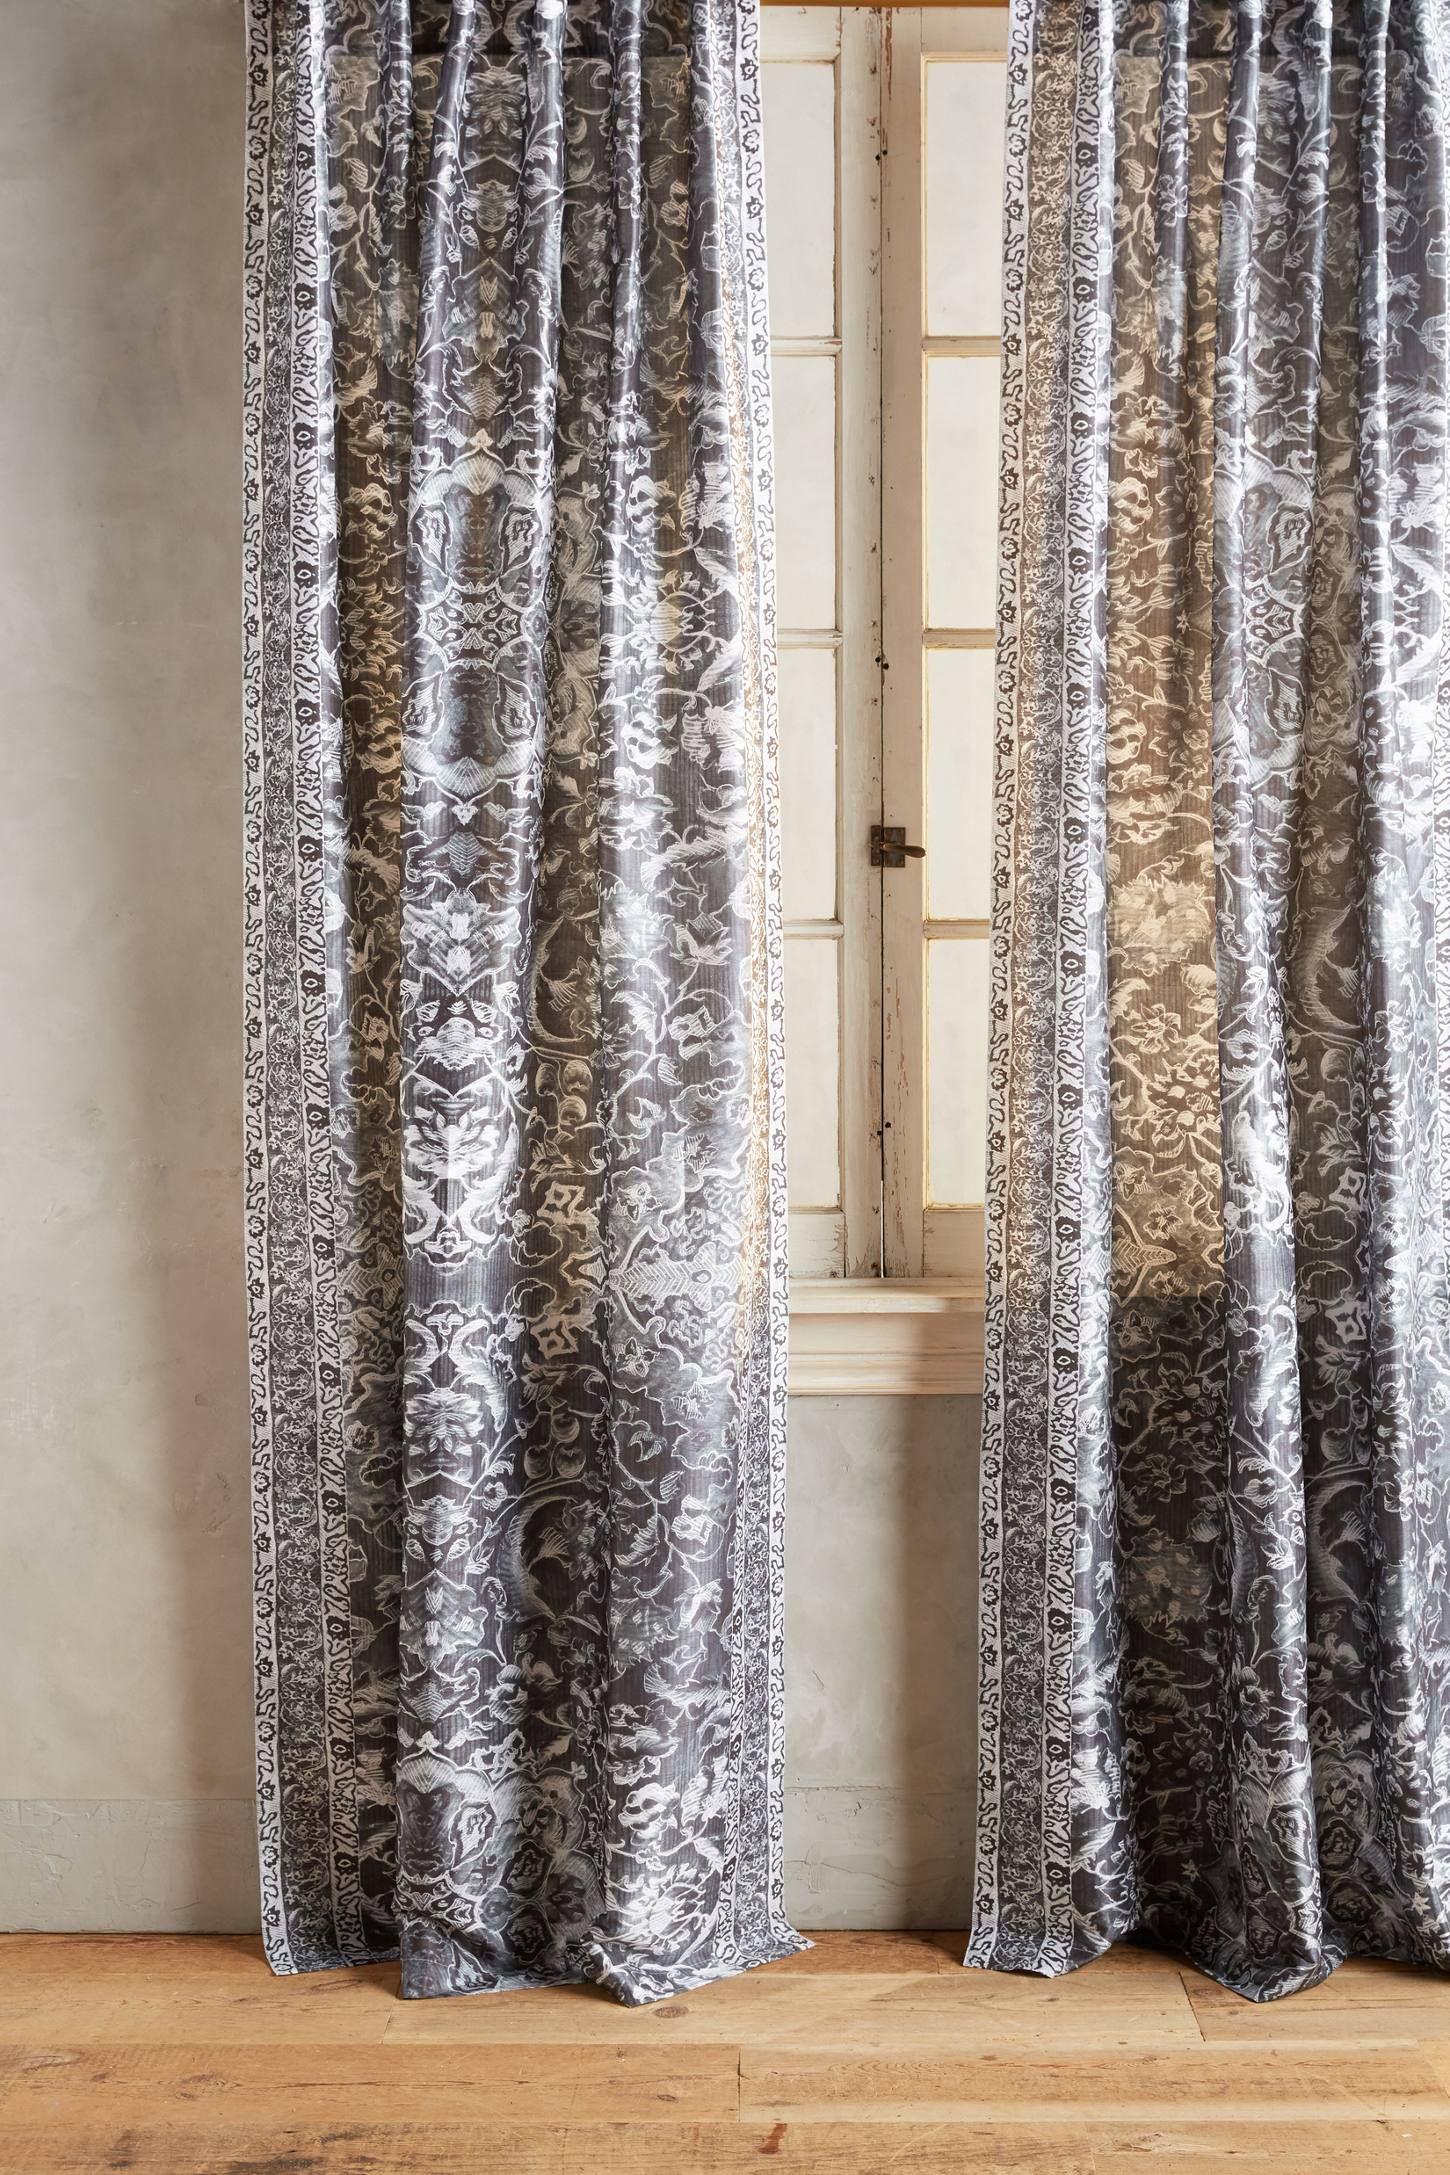 Adjustable Double Curtain Rod Curtains Home Curtains Drapes